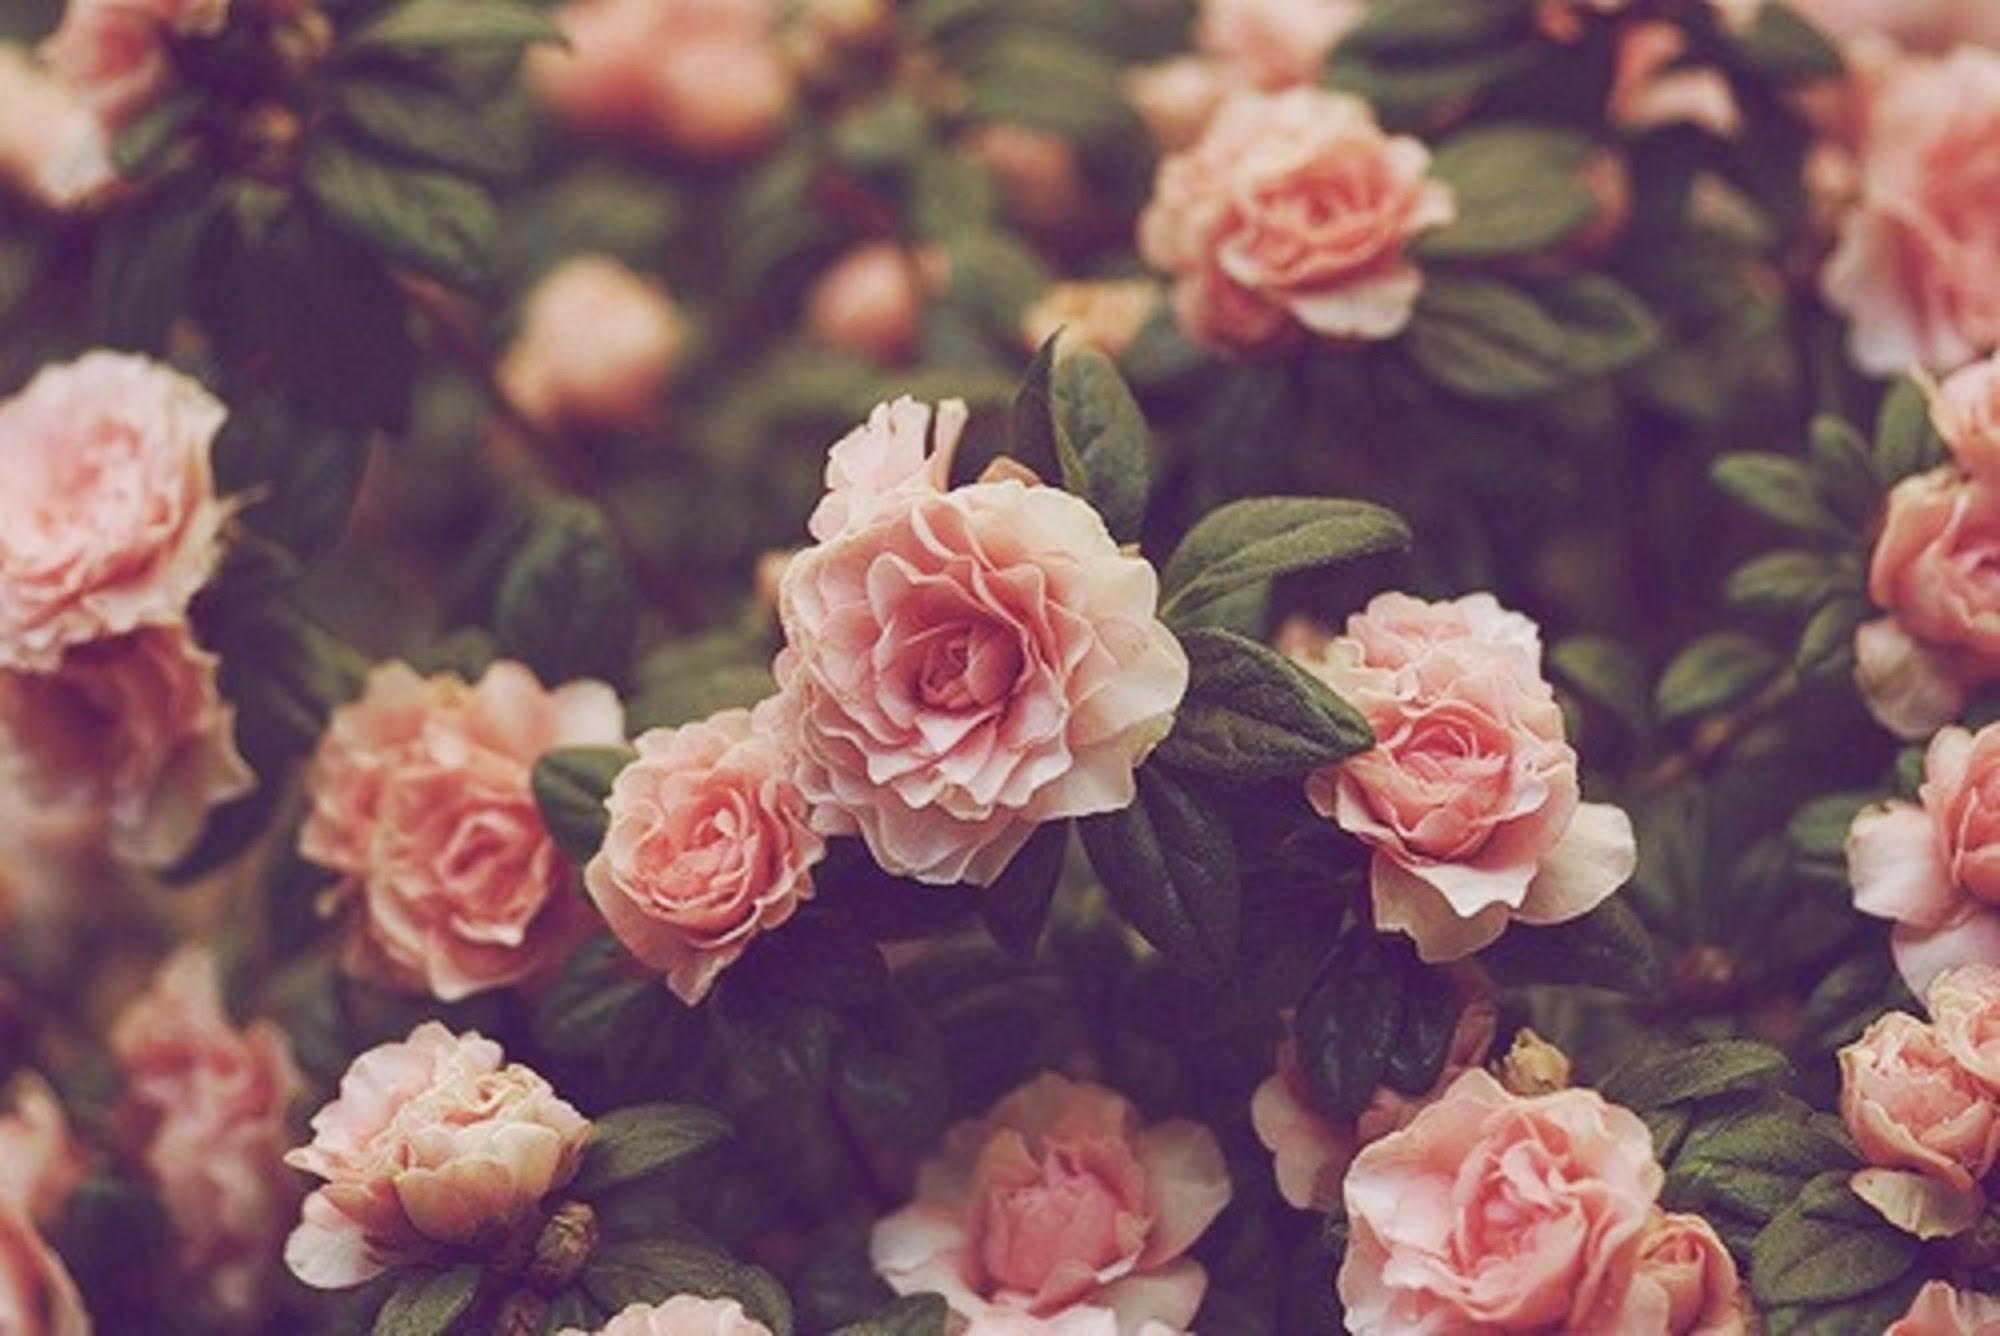 Hipster Flower Backgrounds 51 Images